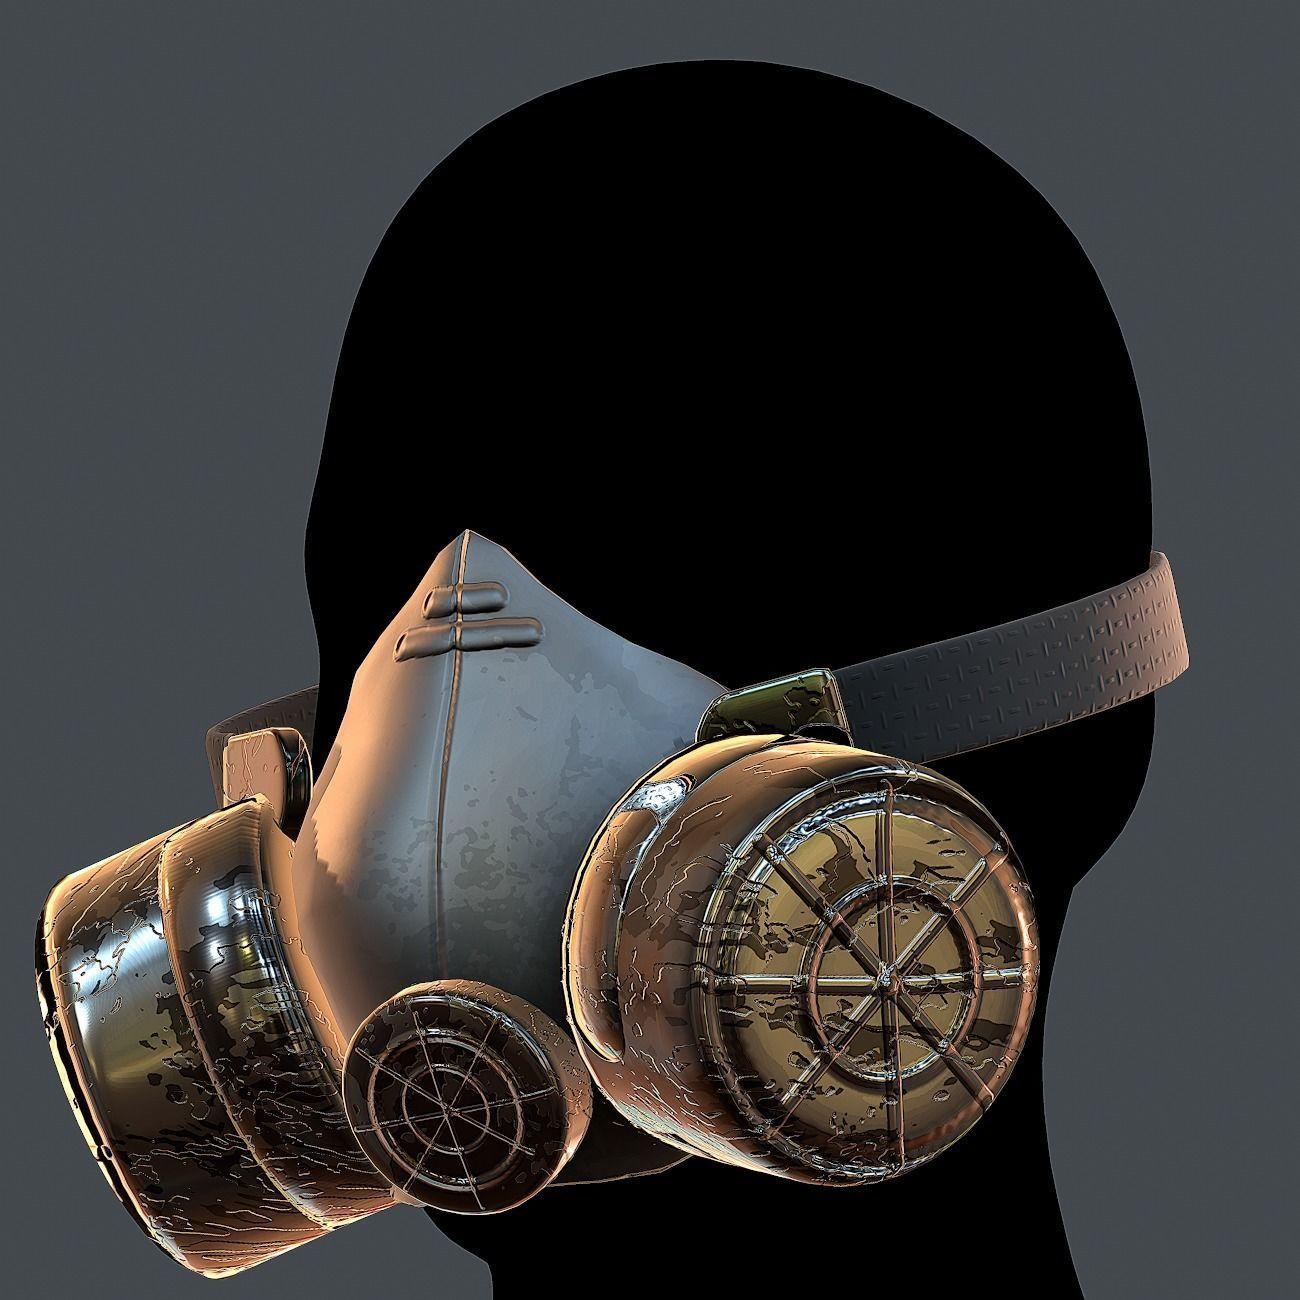 Gas mask helmet 3d model scifi Low-poly Low-poly 3D model